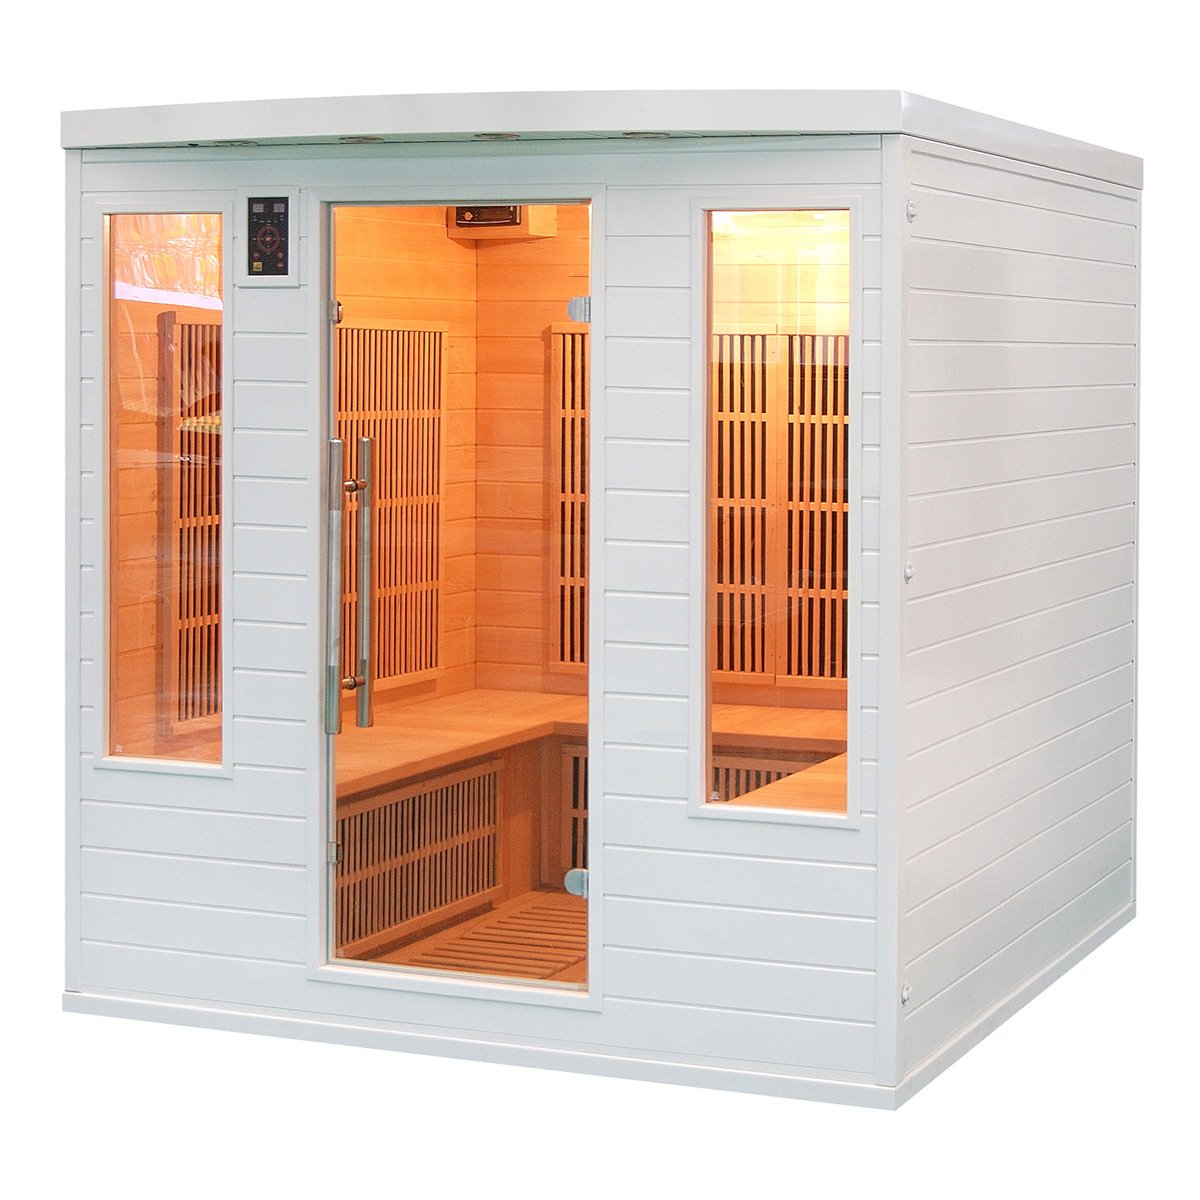 Sauna soleil blanc club 4 5 places - Bienfaits du sauna ...